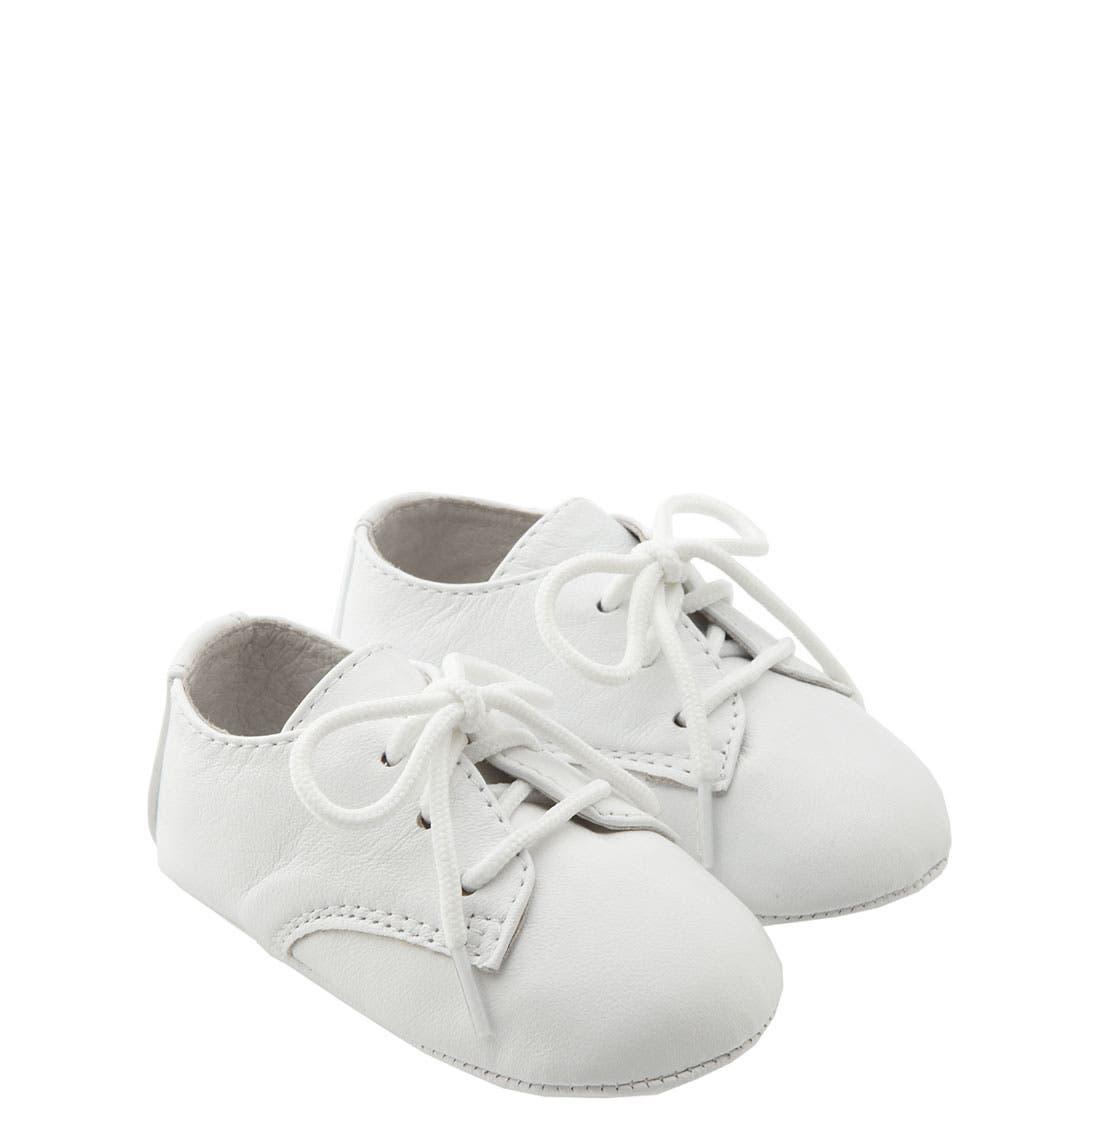 Main Image - Designer's Touch 'Eric' Crib Shoe (Baby)